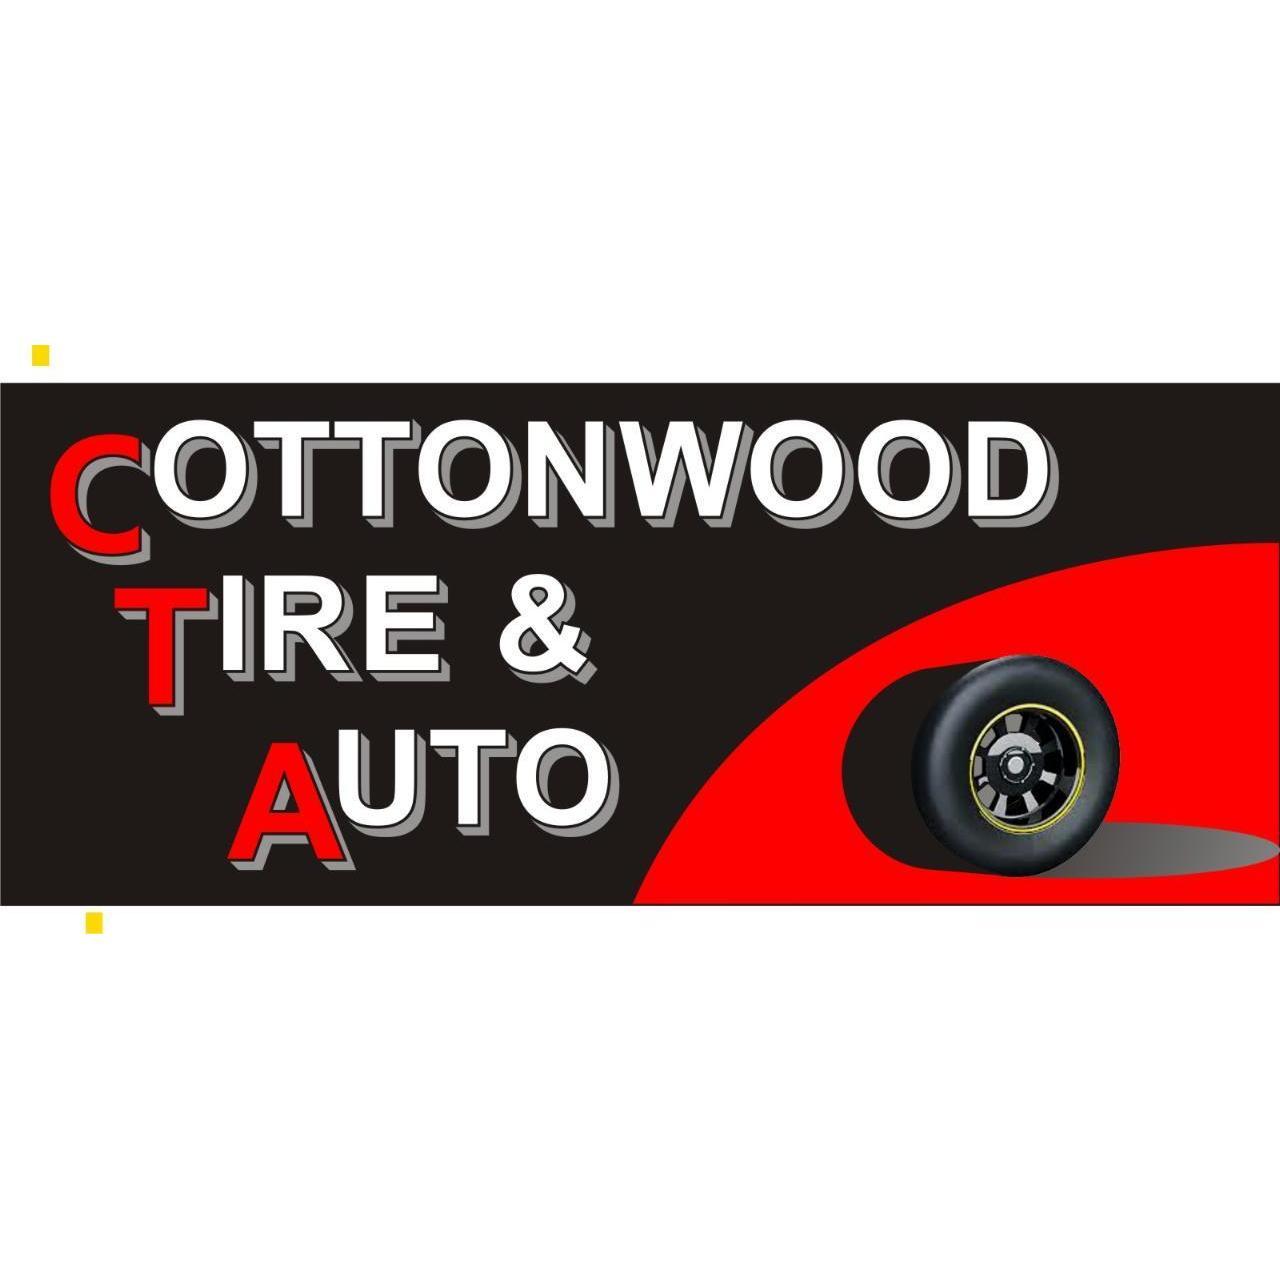 Cottonwood Tire & Auto